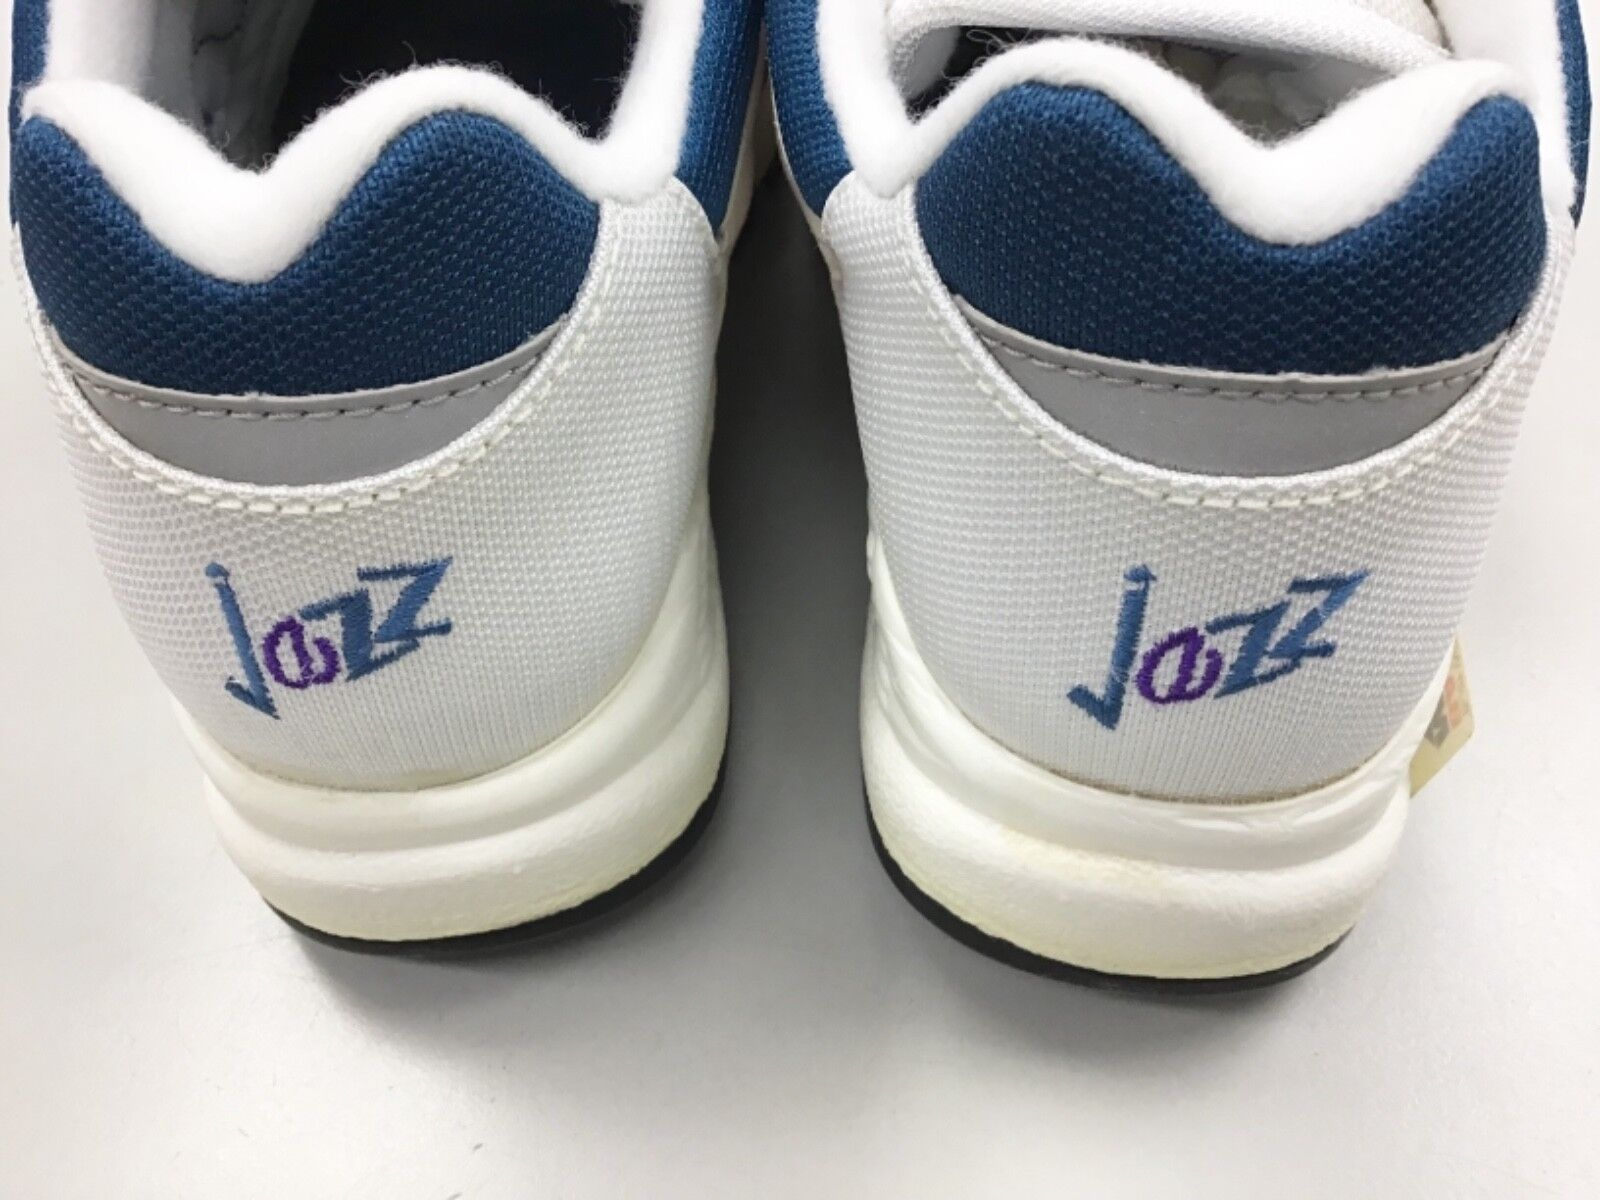 Vintage 90's Saucony Jazz 4000 bianca Berry Berry Berry blu donna running scarpe e8e7a9